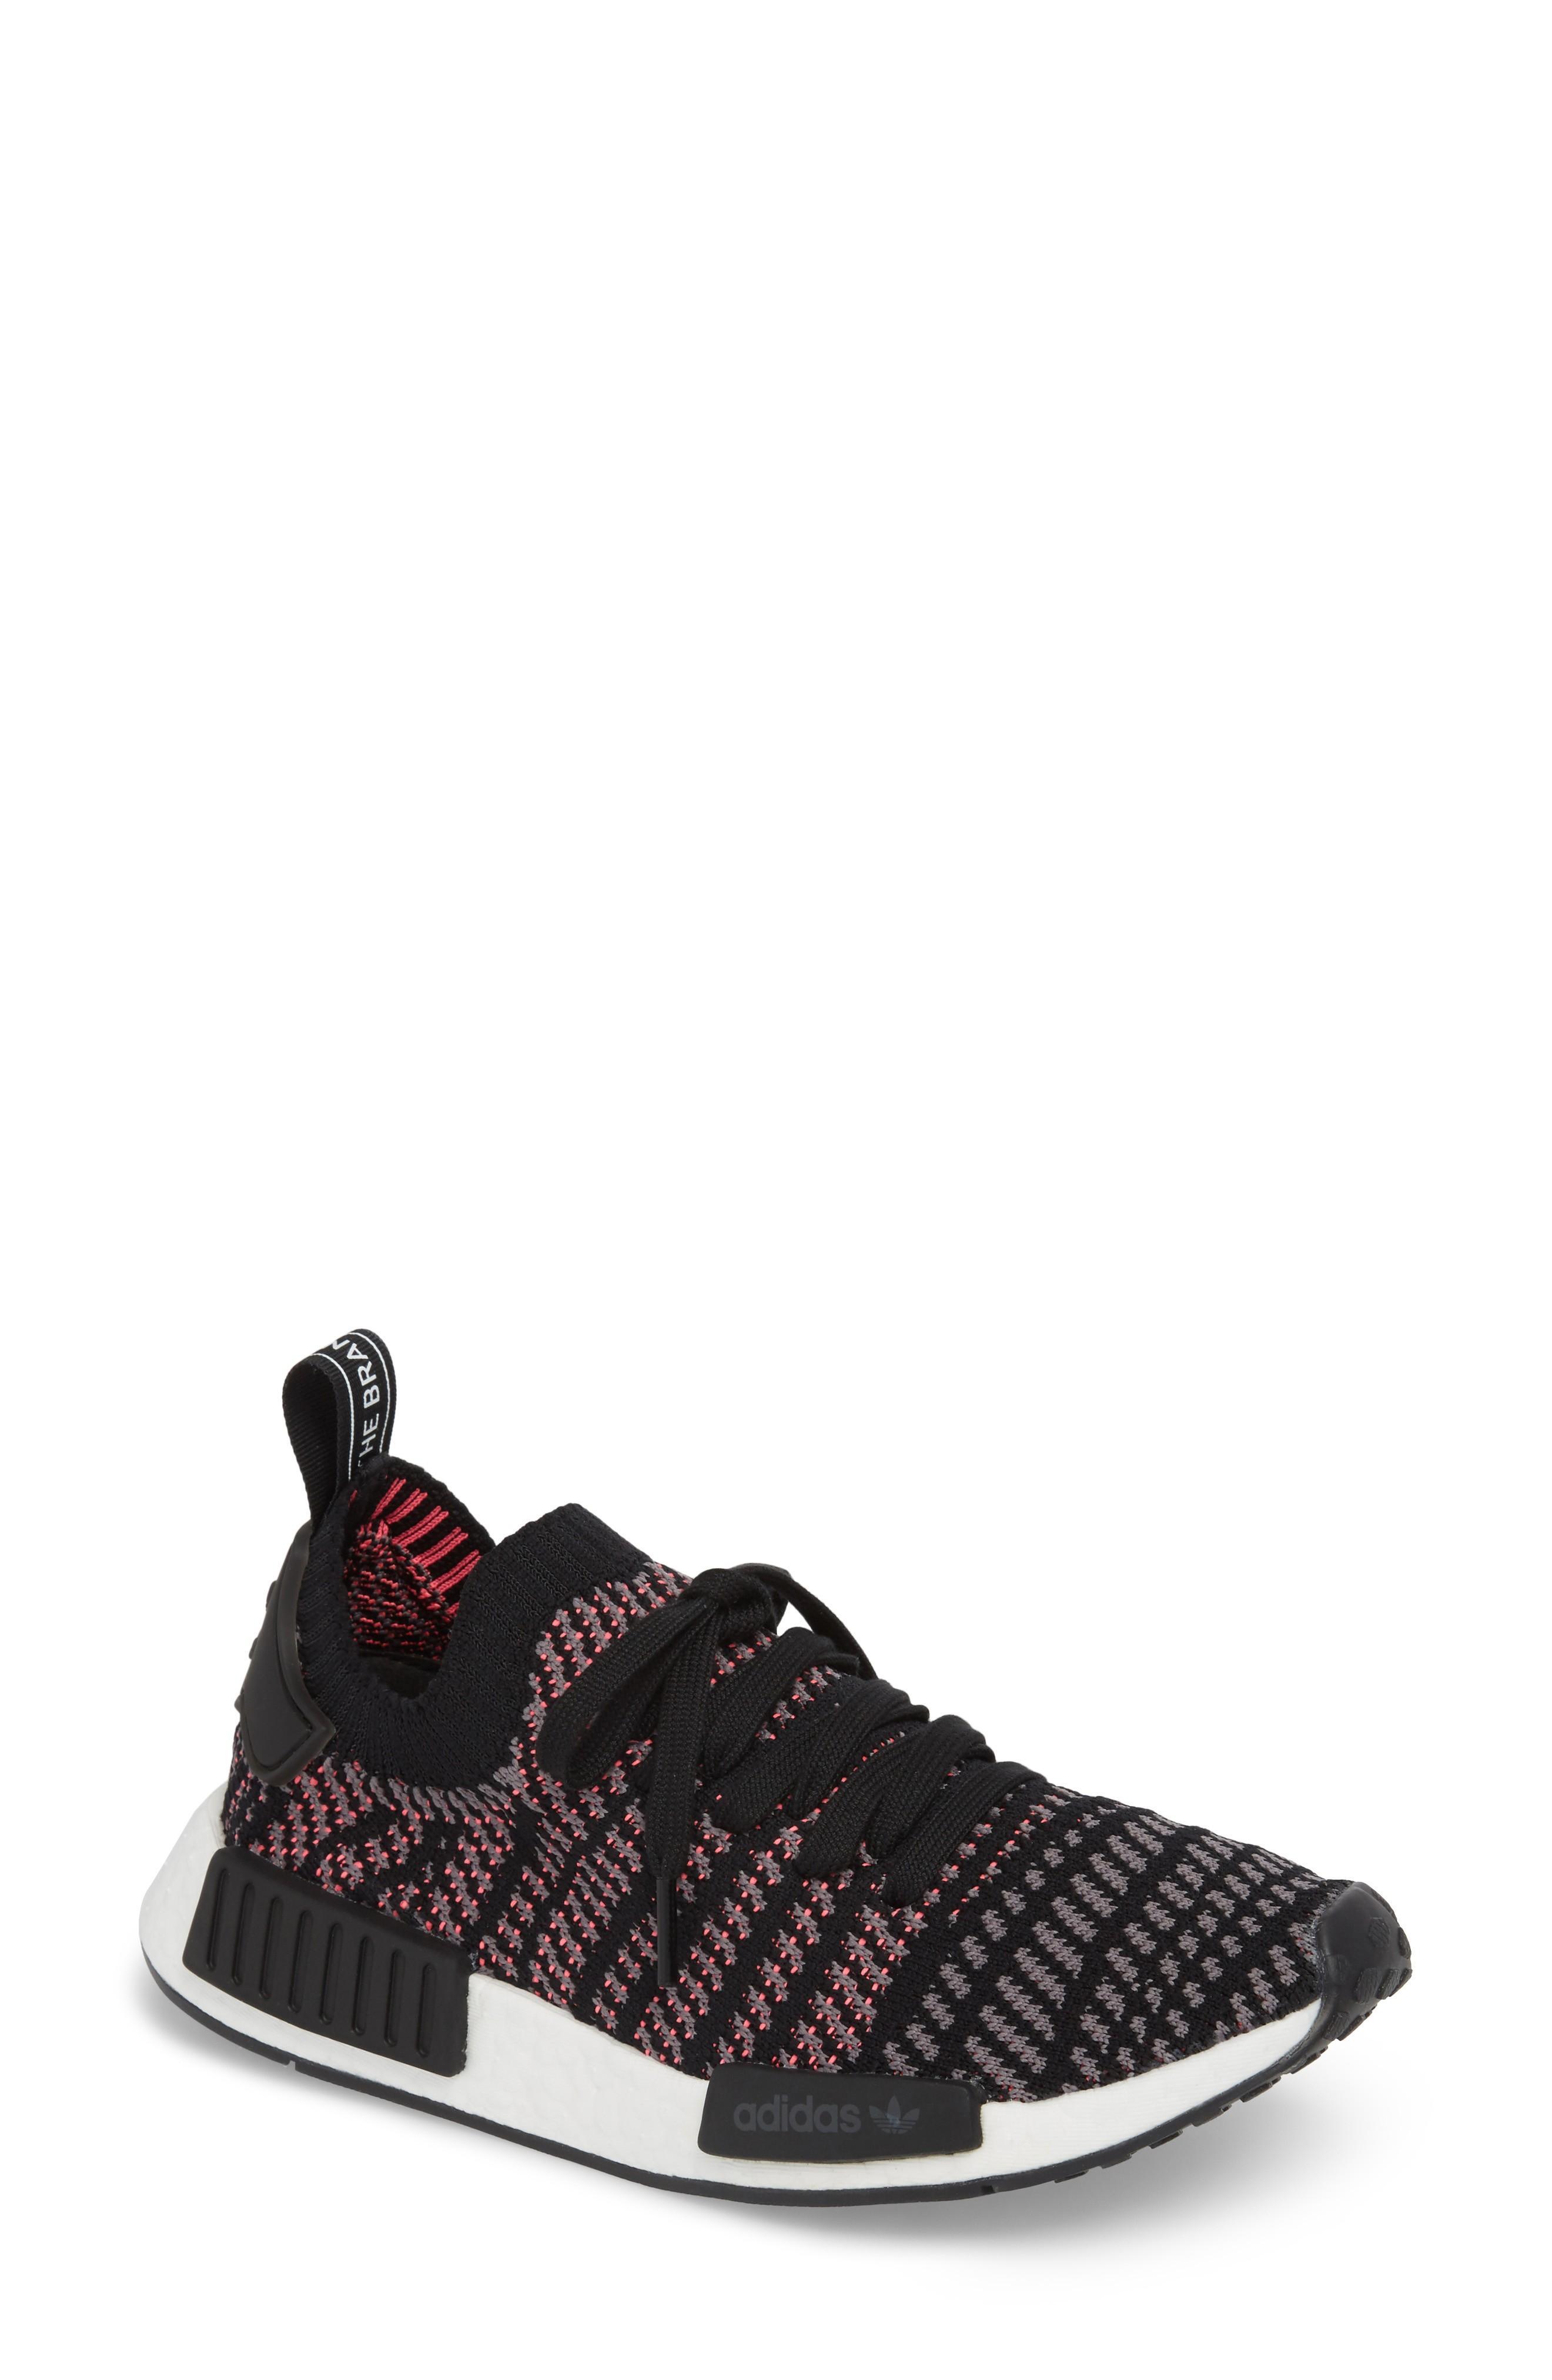 943b8f8d2e771 ADIDAS ORIGINALS. Nmd R1 Stlt Primeknit Sneaker in Core Black  Grey  ...